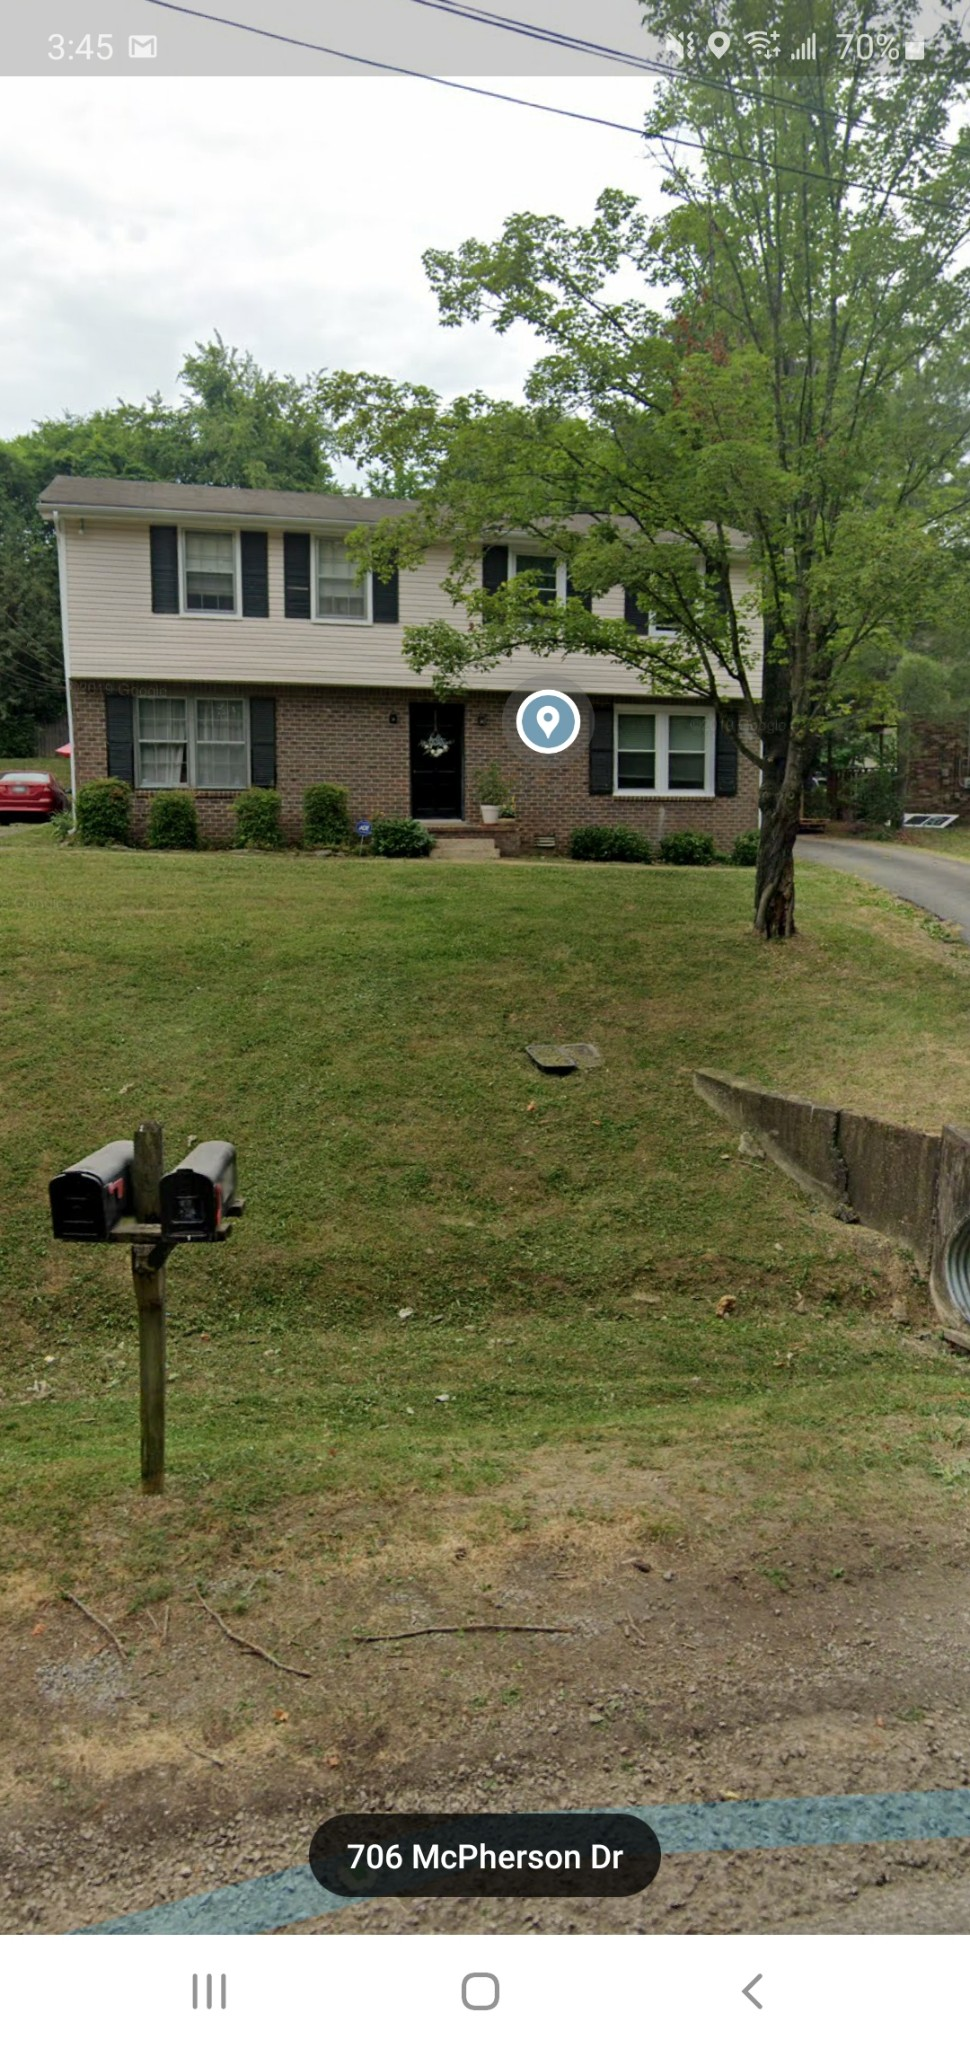 704 McPherson Dr Property Photo - Nashville, TN real estate listing